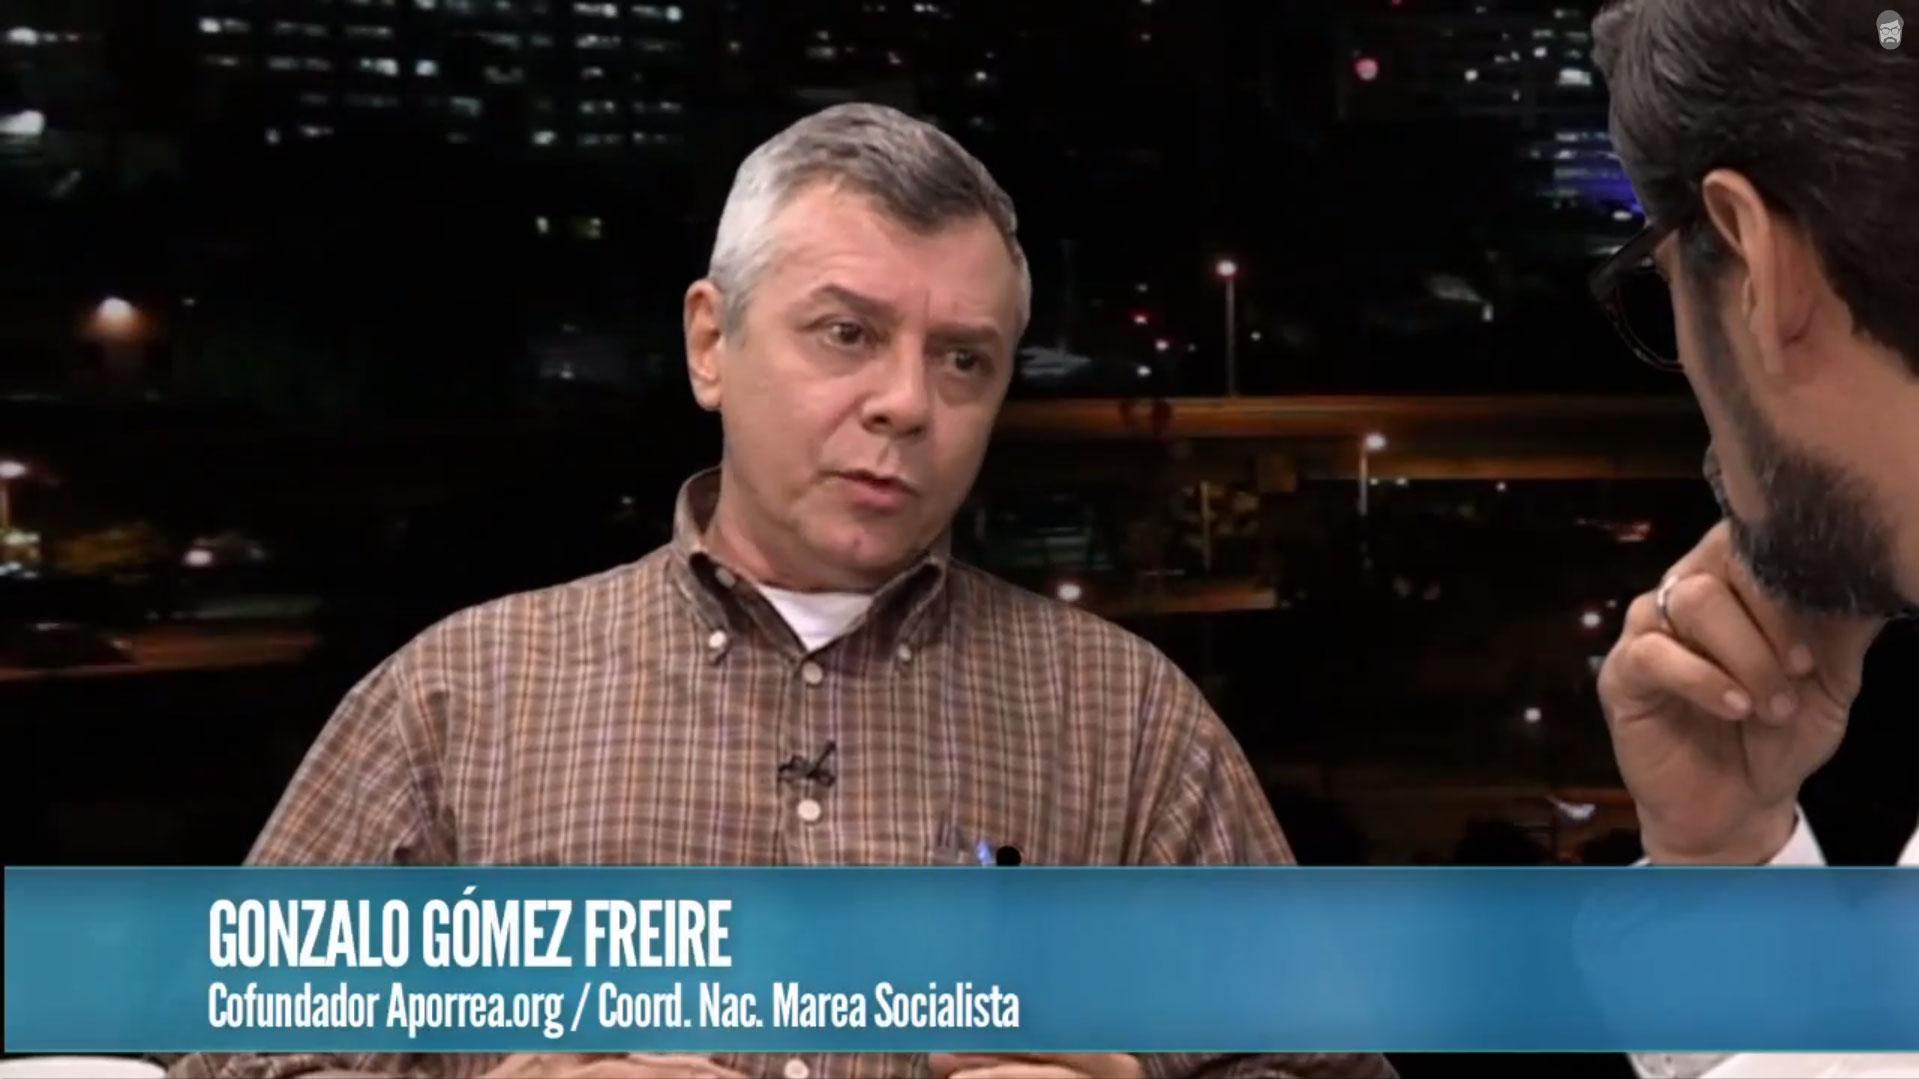 Briceño entrevista a Gonzalo Gómez (Fundador de Aporrea) - Reporte Semanal